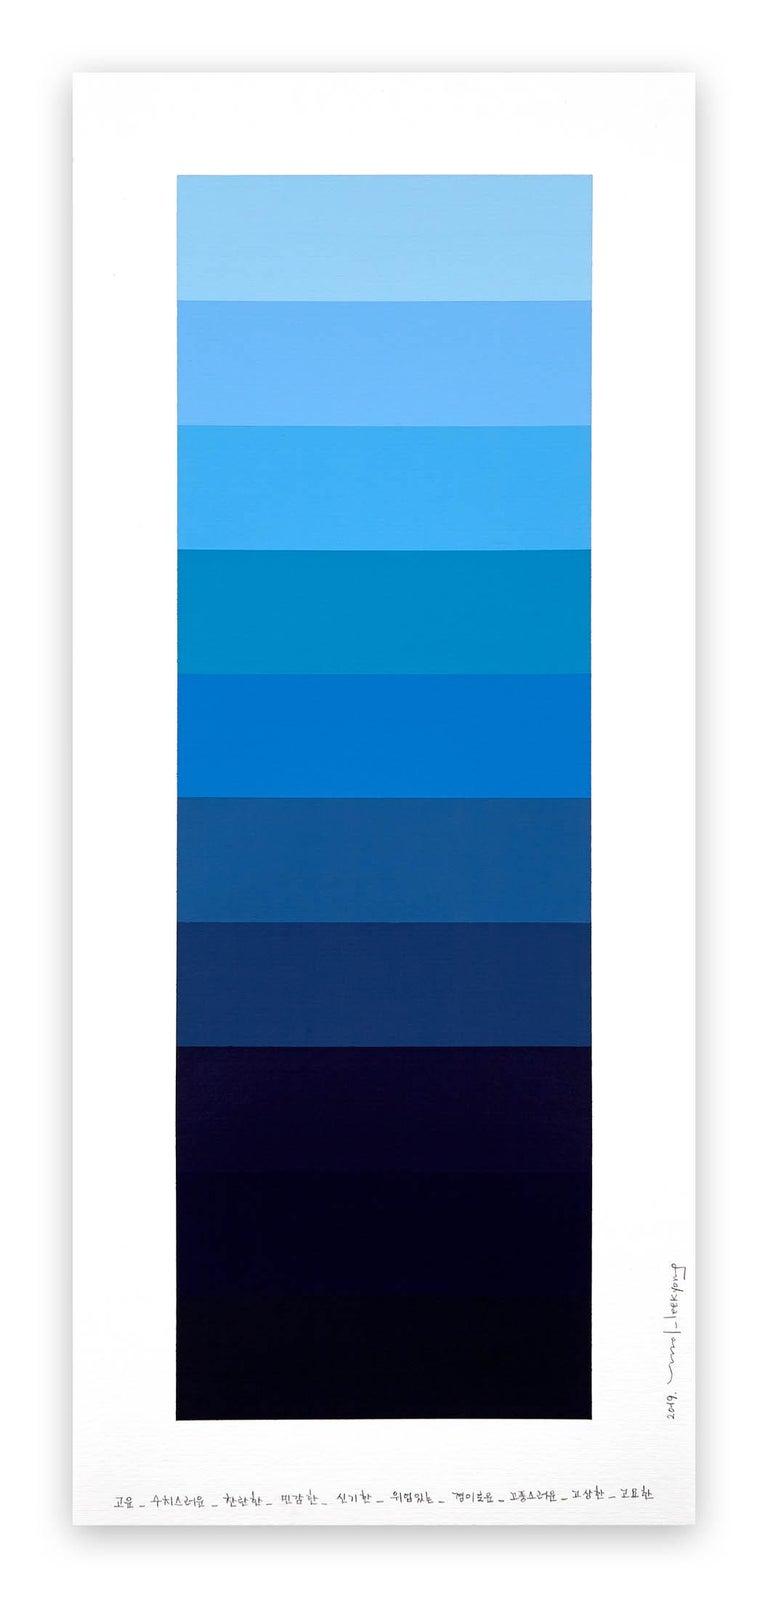 Kyong Lee Abstract Drawing - Emotional Color Chart 099